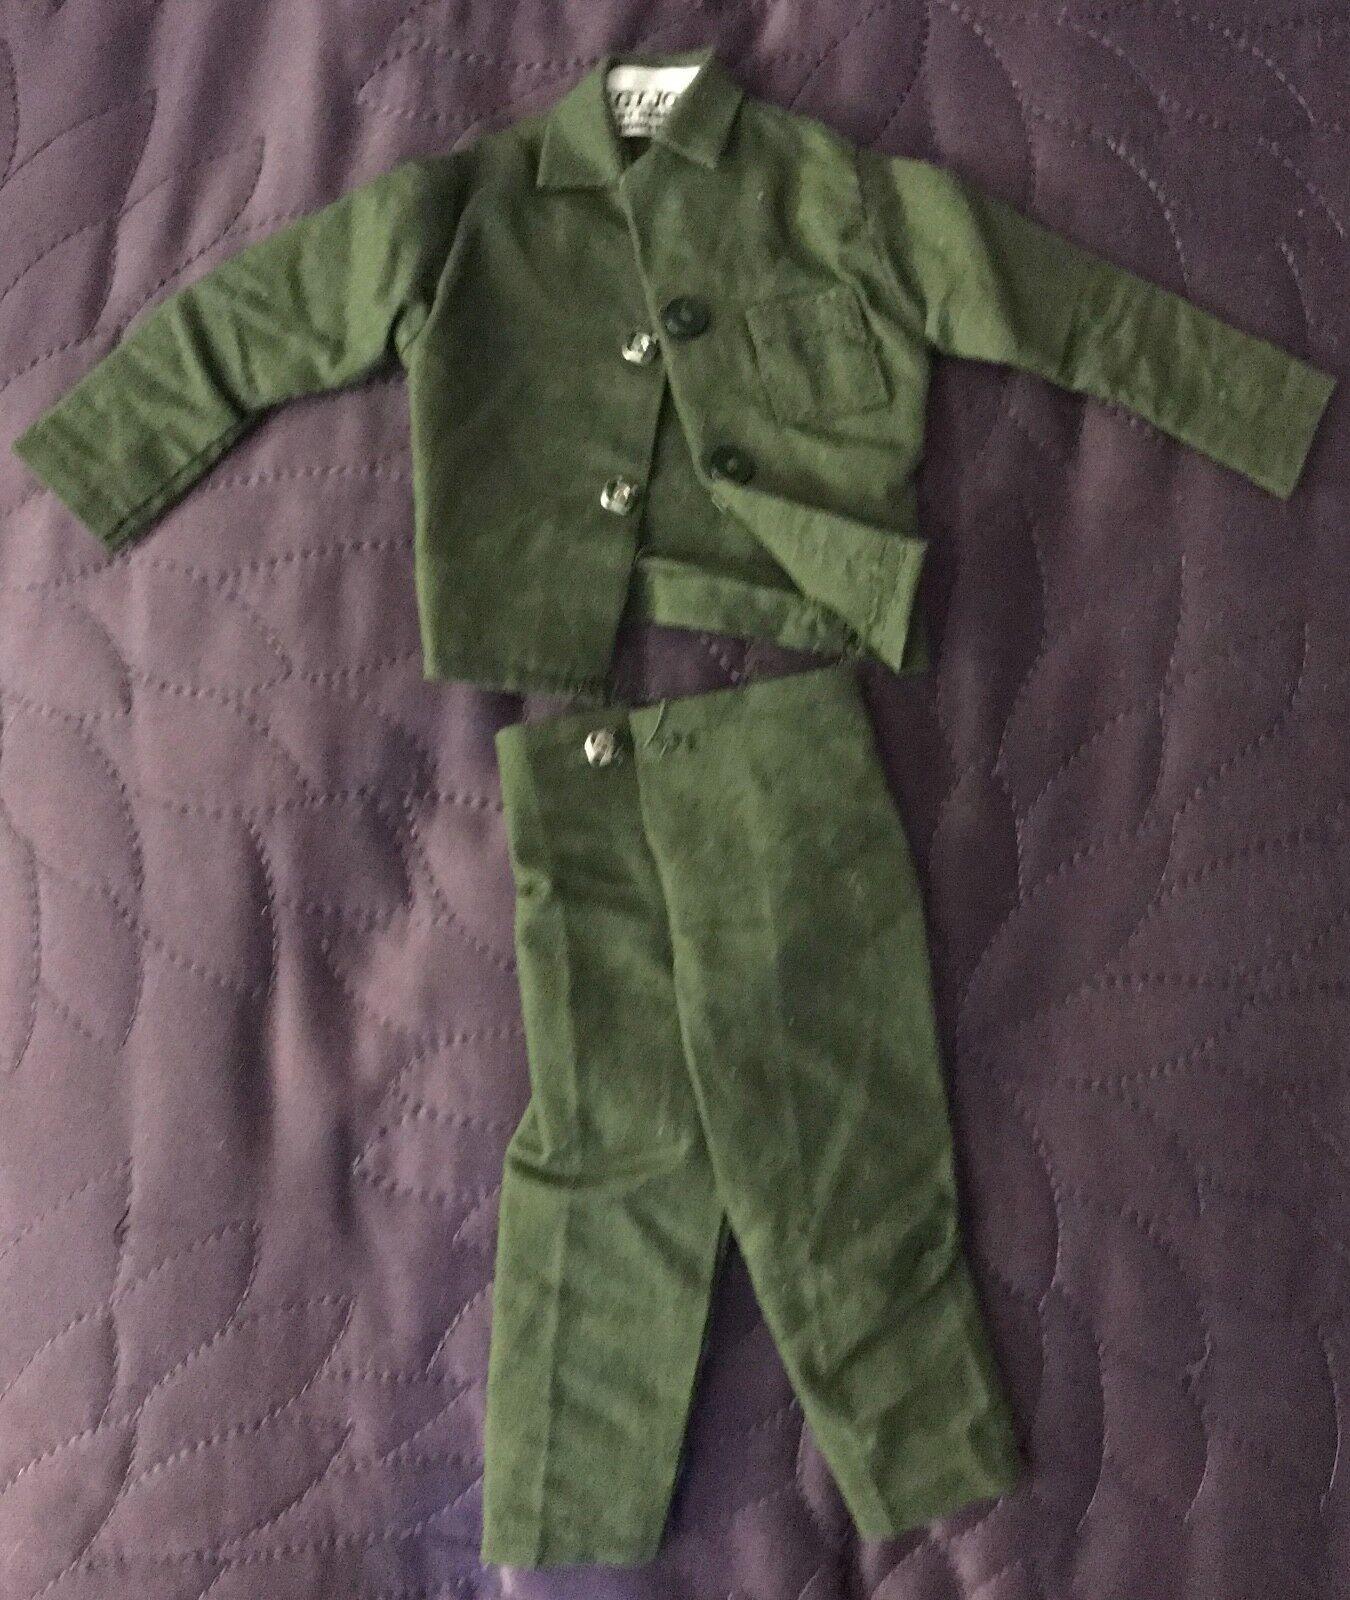 HASBRO  GI JOE  ADVENTURE TEAM  DANGEROUS MISSION  SHIRT AND PANTS  C. 1974